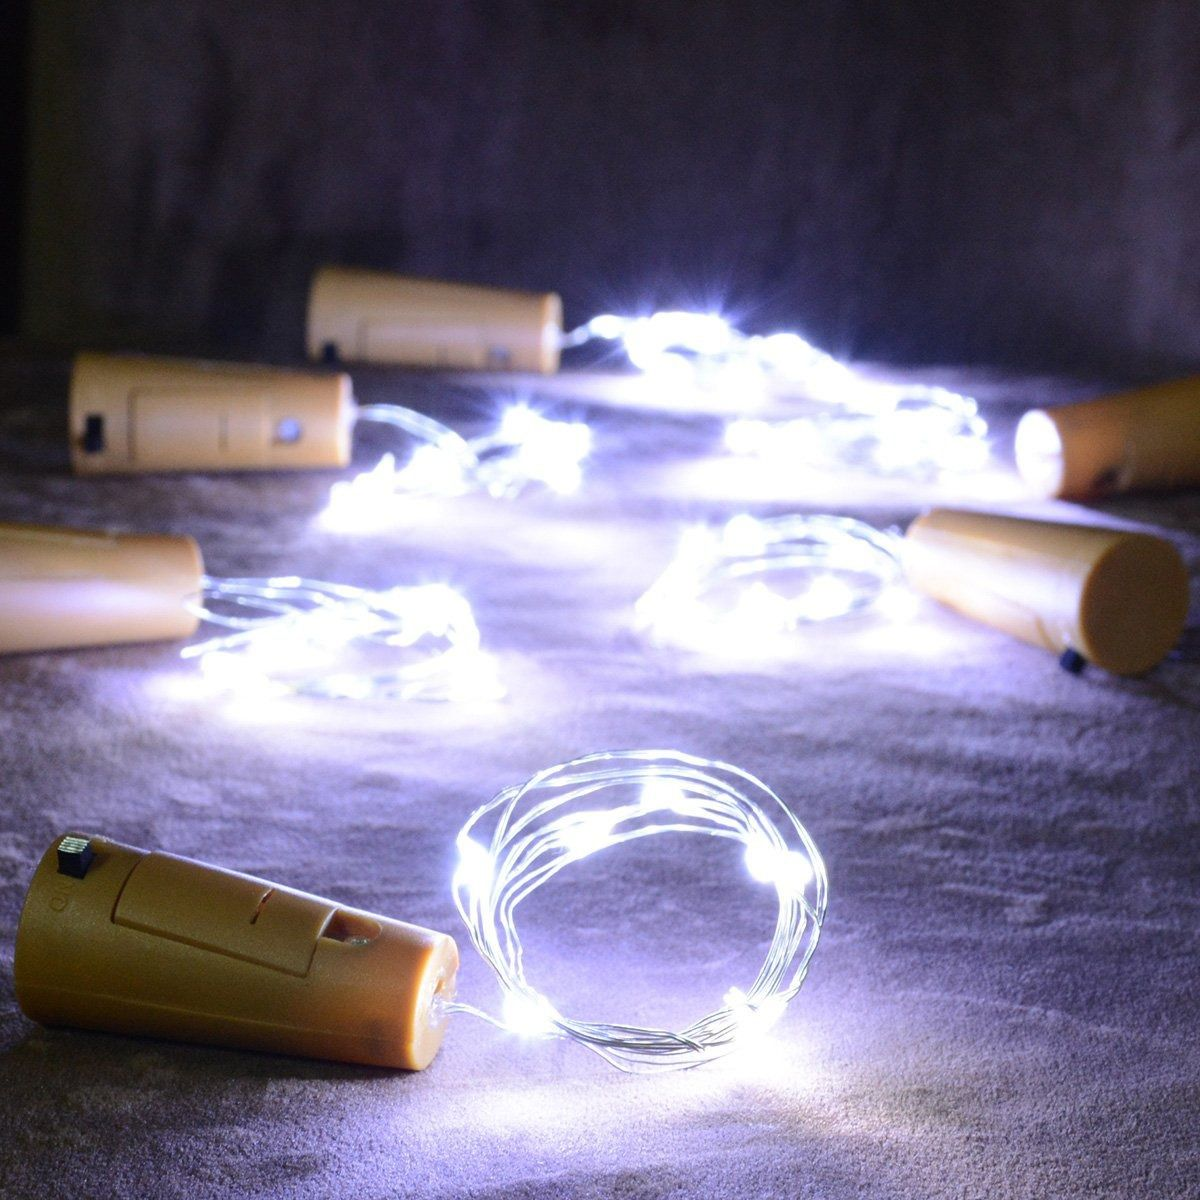 Fio Luz de Fada em Rolha de Garrafa 2 metros - Branca  - Shop Ud